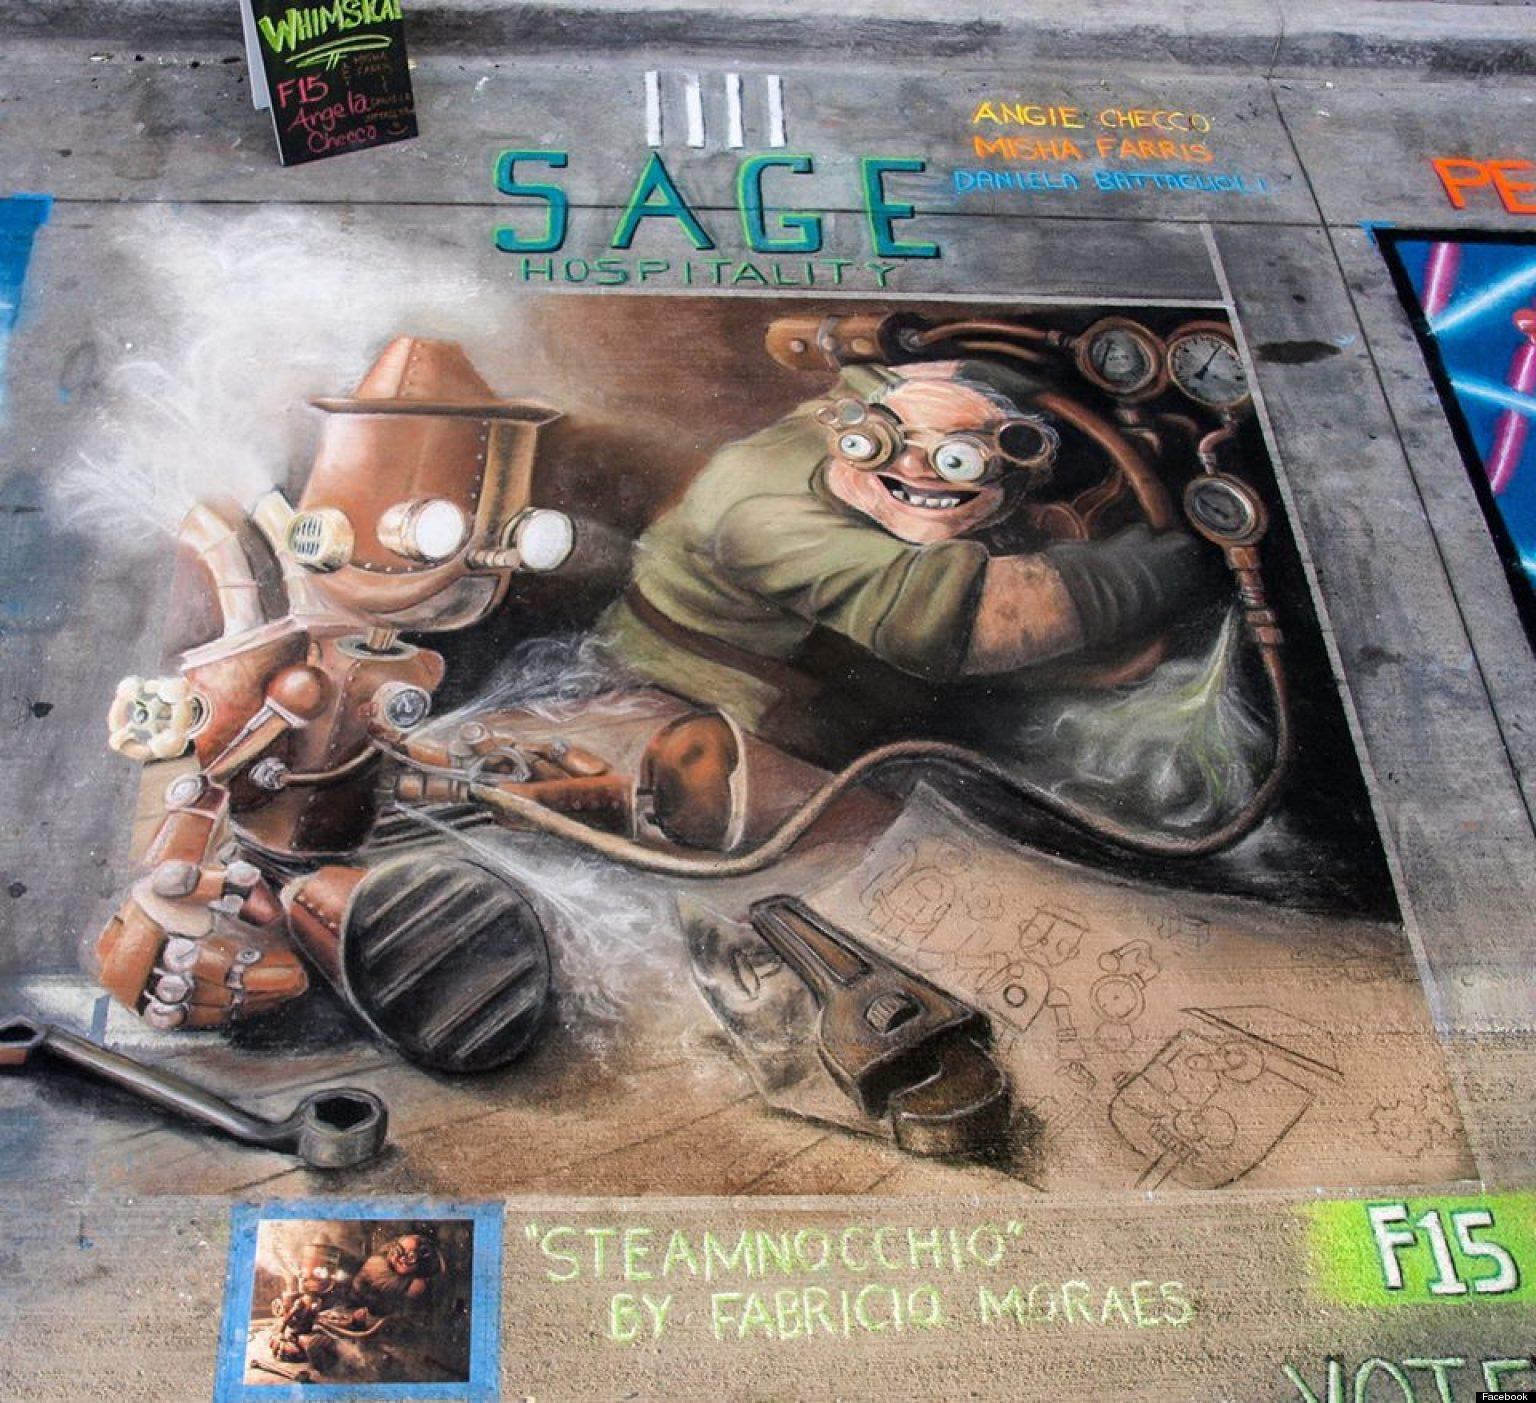 Denver Chalk Art Festival Draws Thousands To Larimer